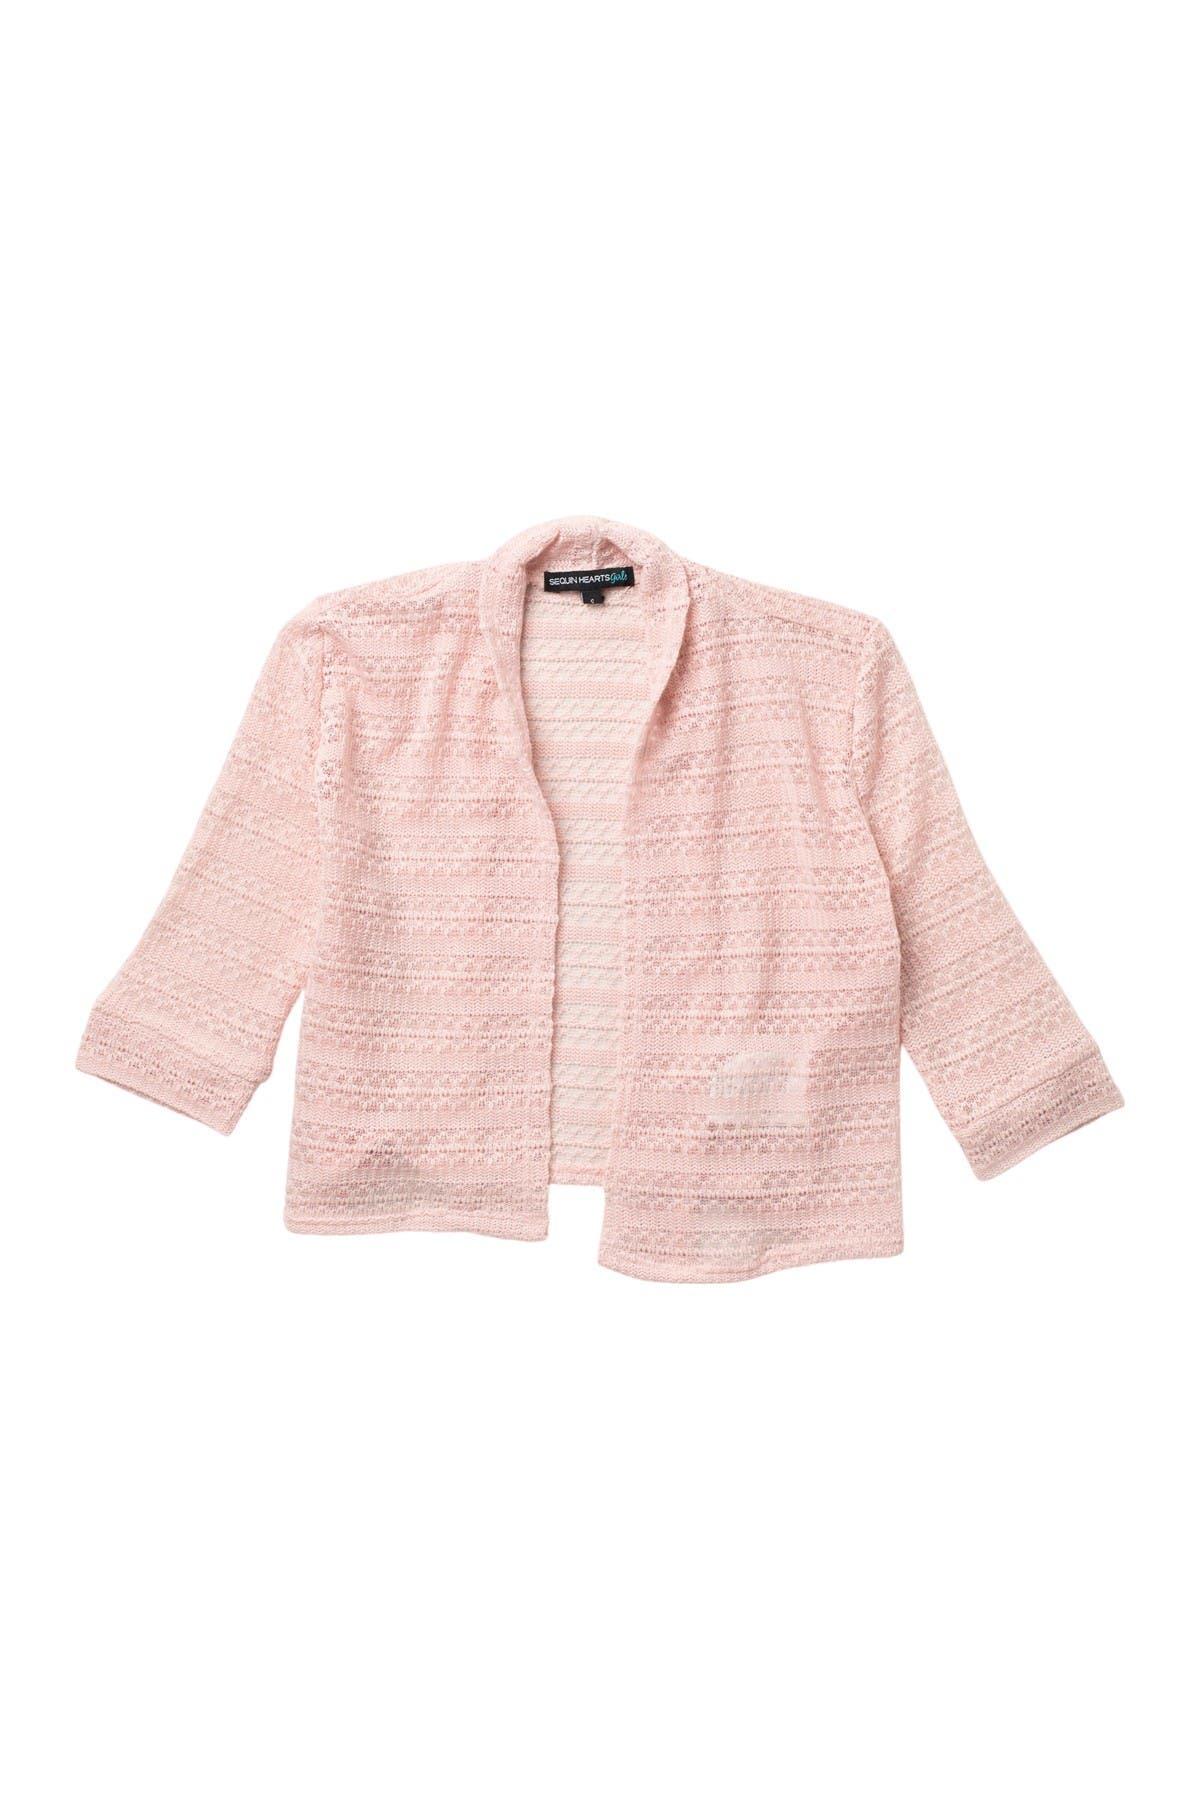 Image of mymichelle Pointelle Shrug Sweater